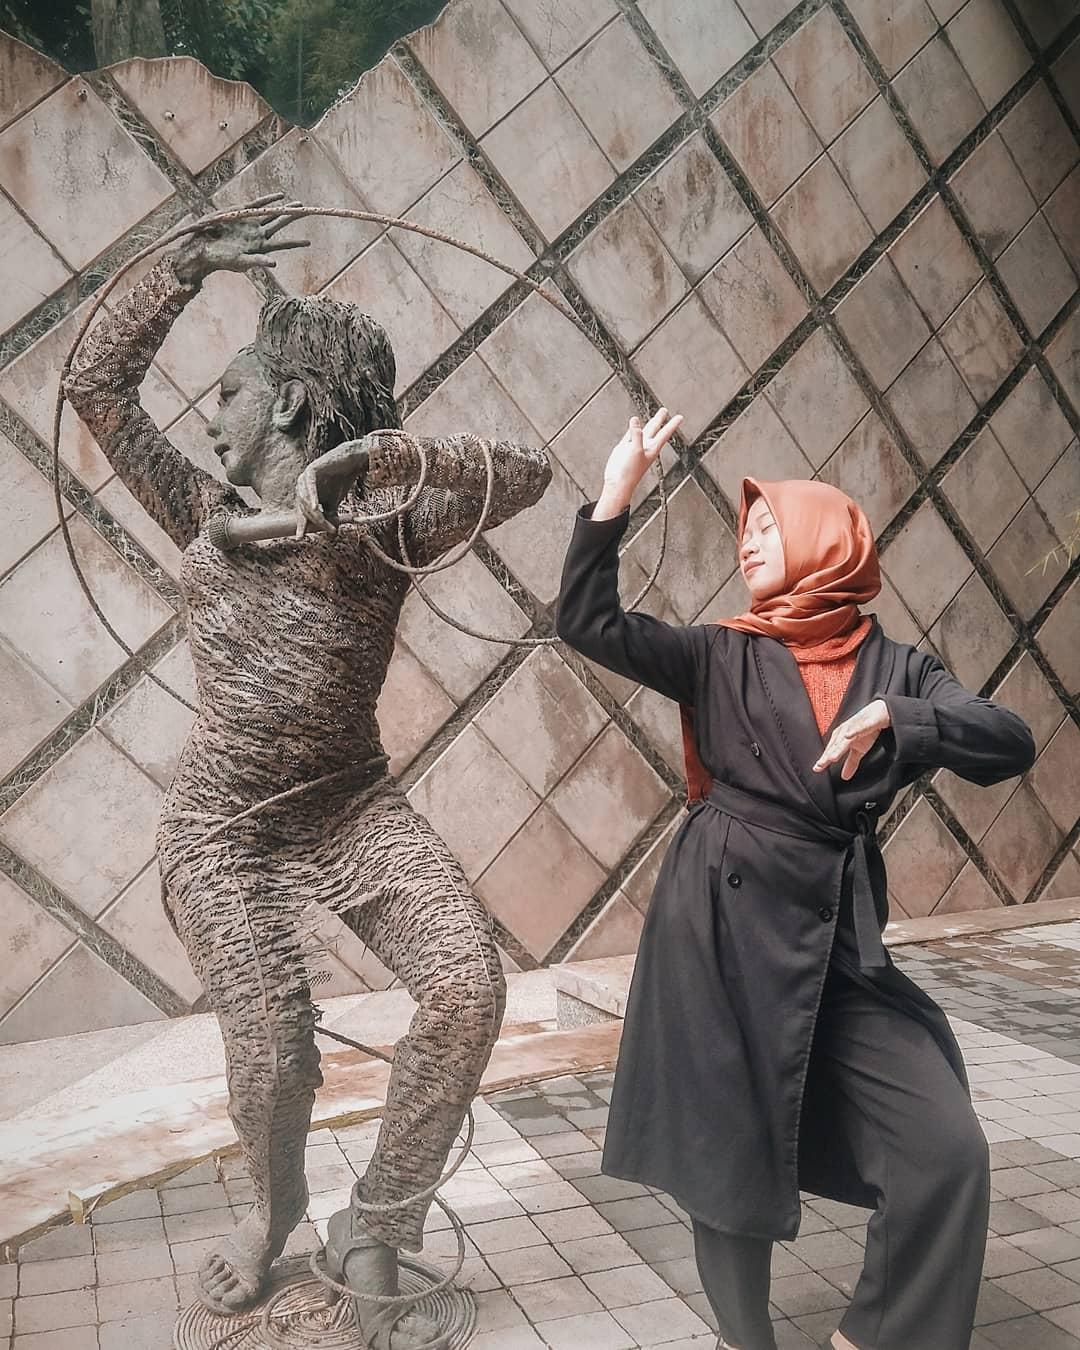 Patung di Nuart Sculpture Park